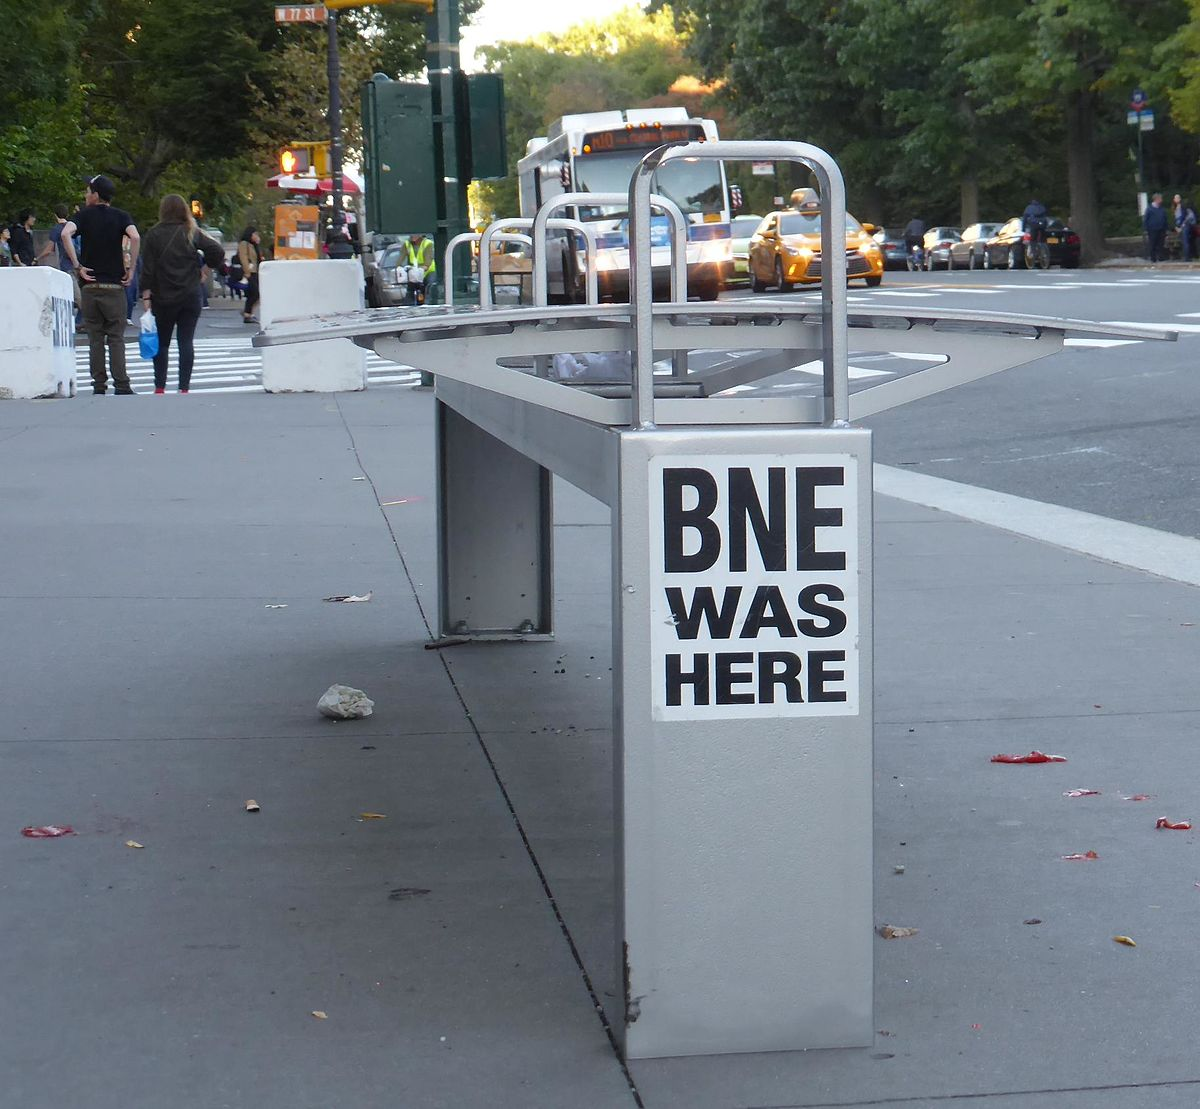 Brisbane Art Guide – BNE ART